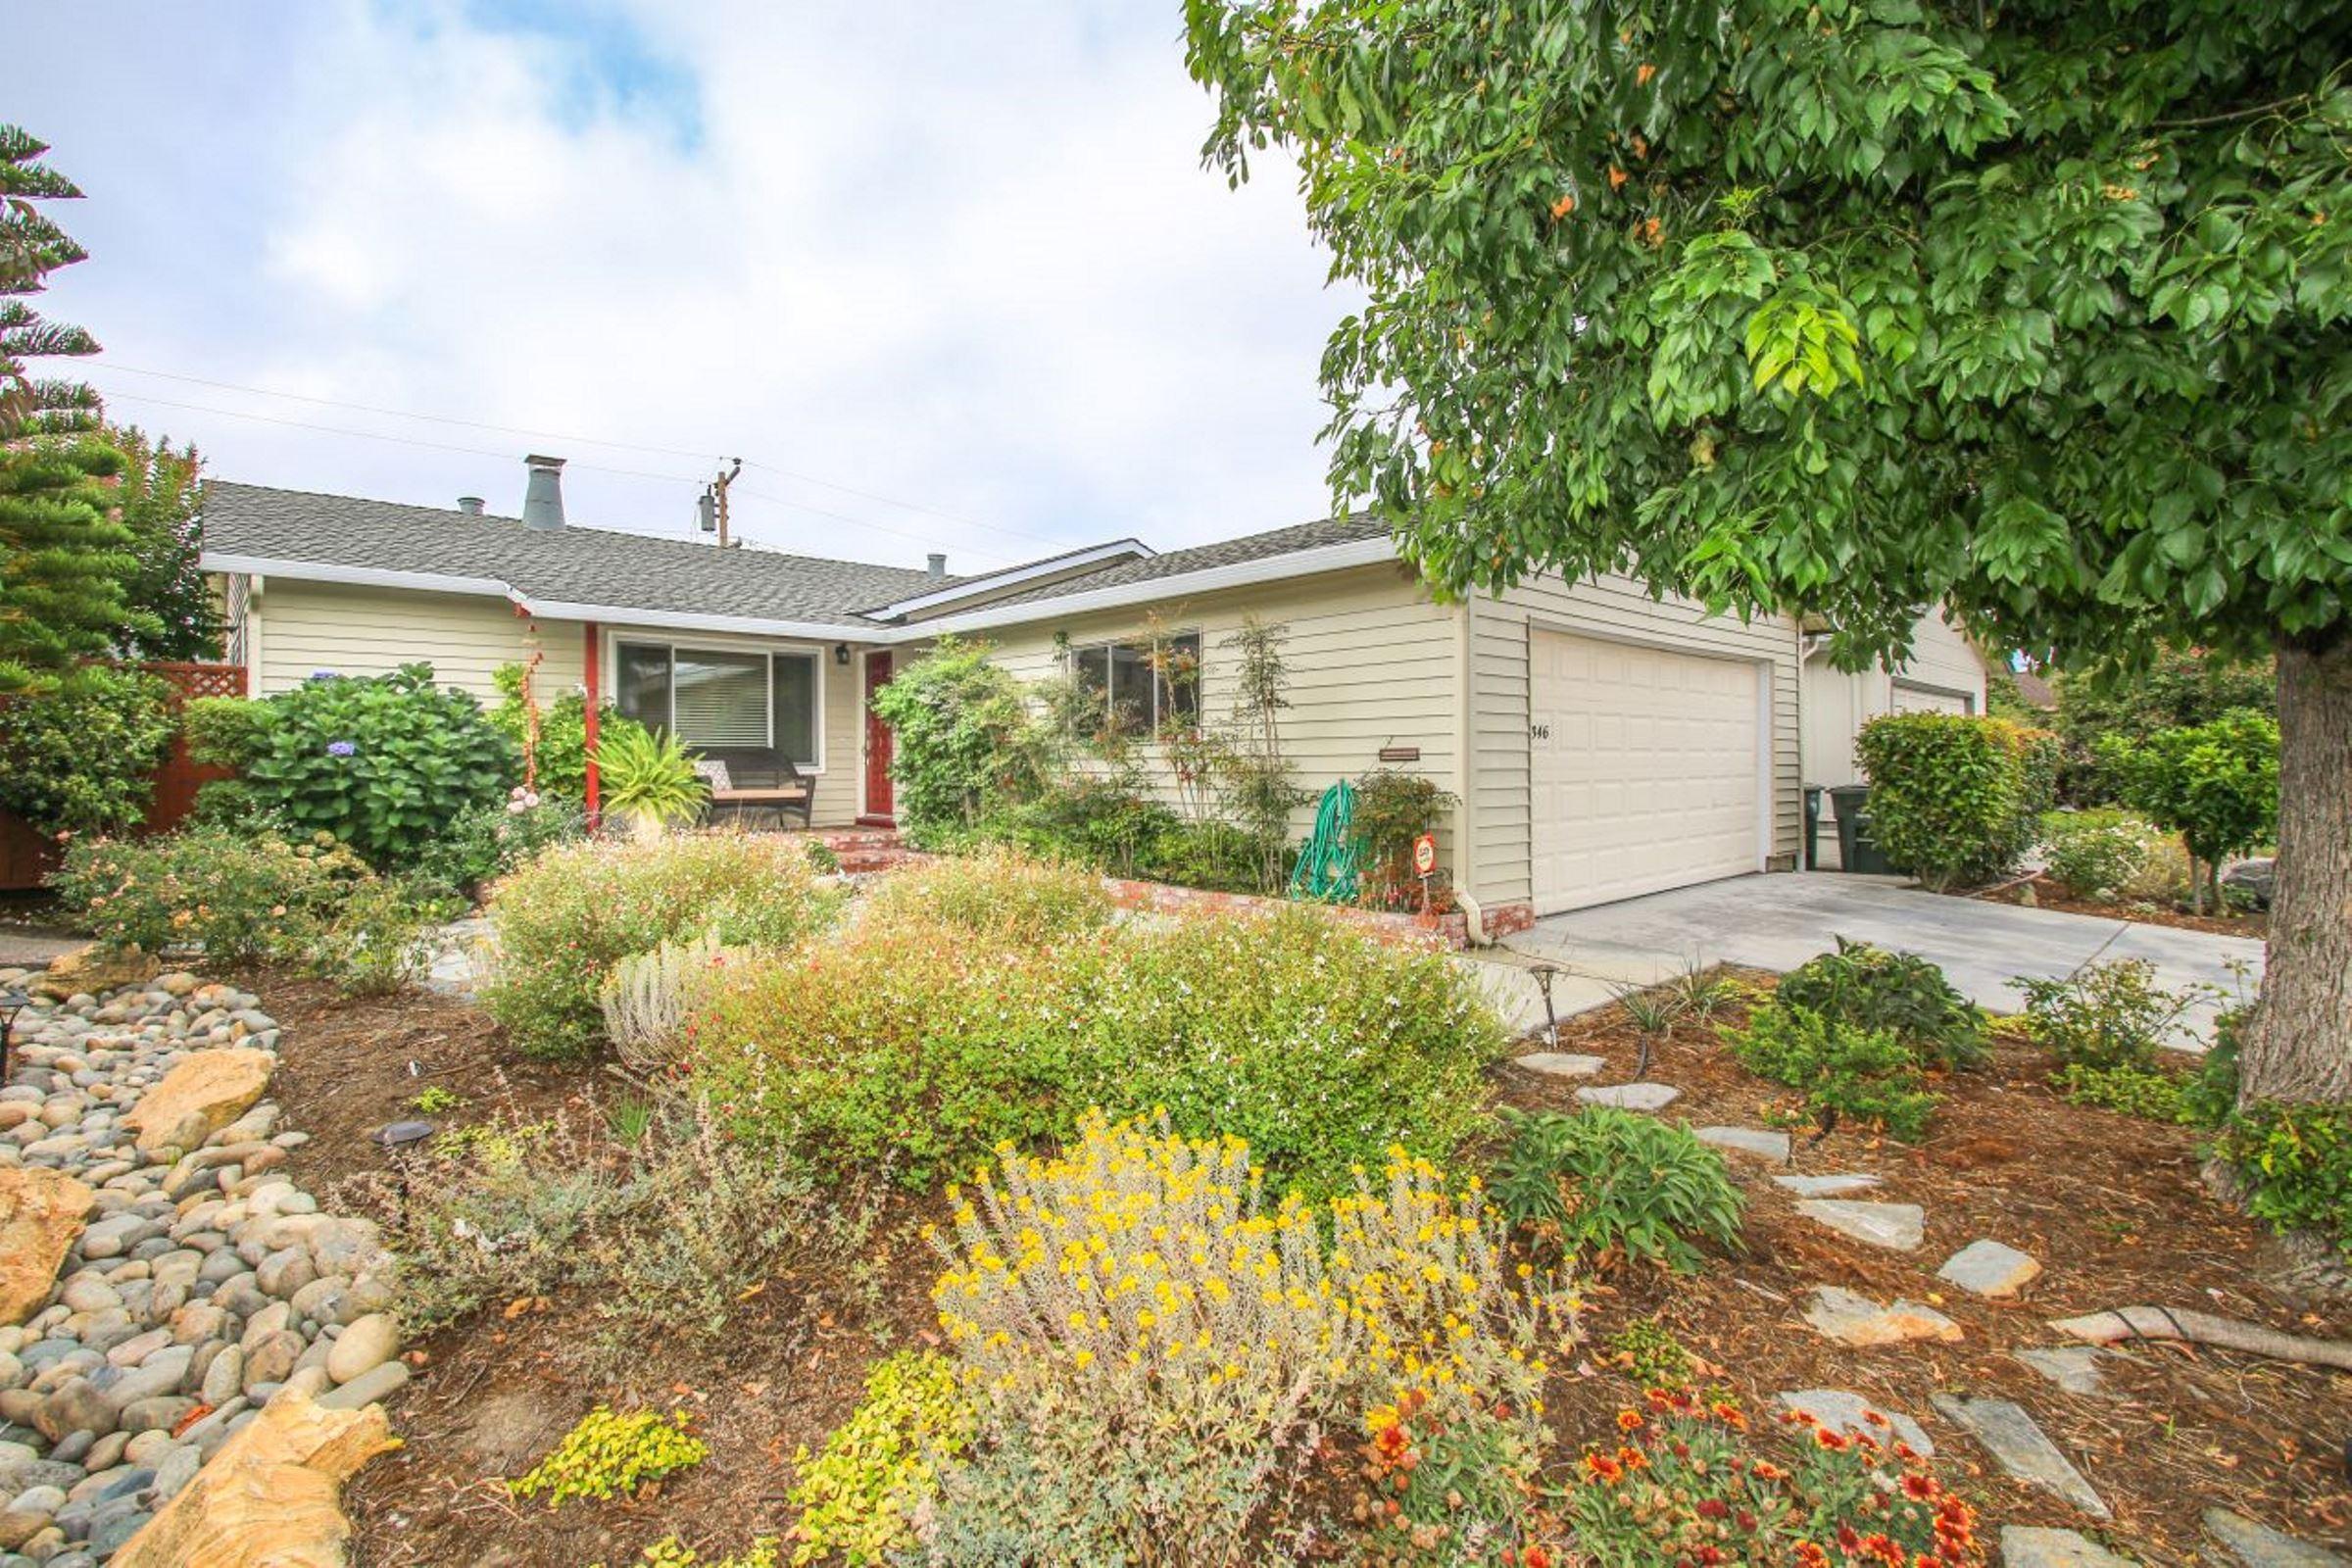 2346 Clipper St, San Mateo, CA 94403